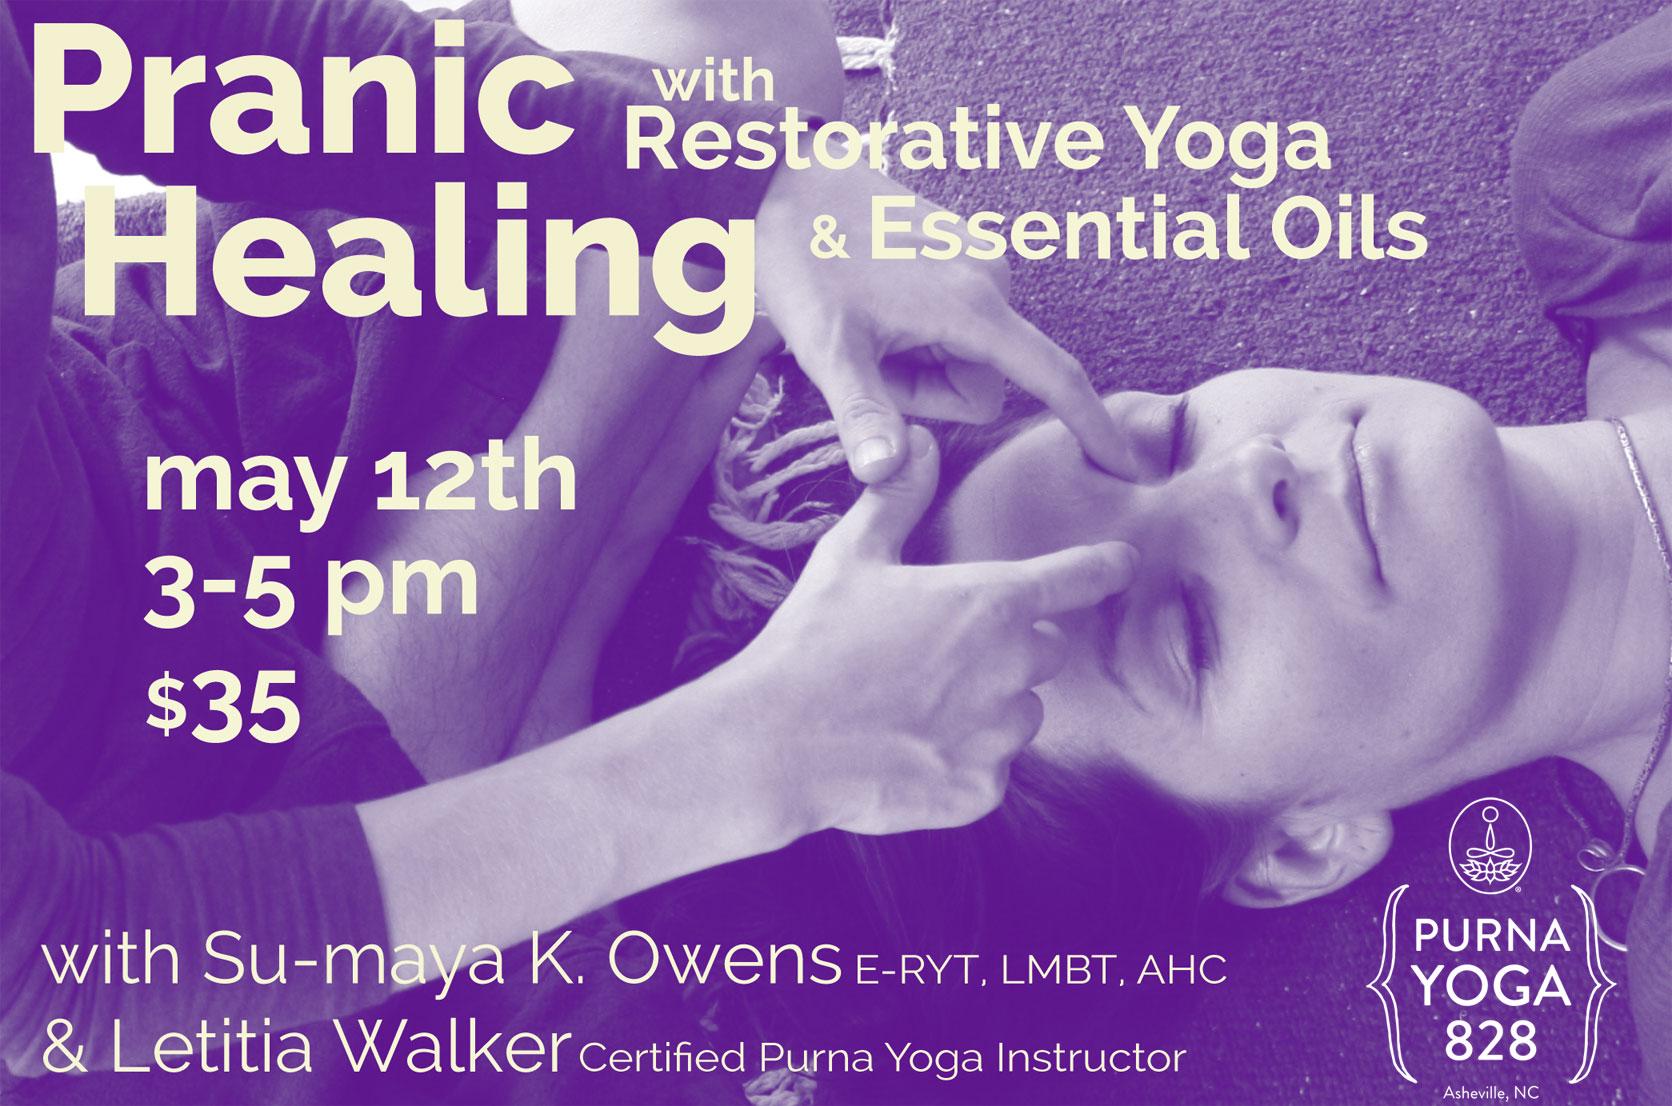 Pranic Healing Restorative Yoga Workshop   Live Yoga Now